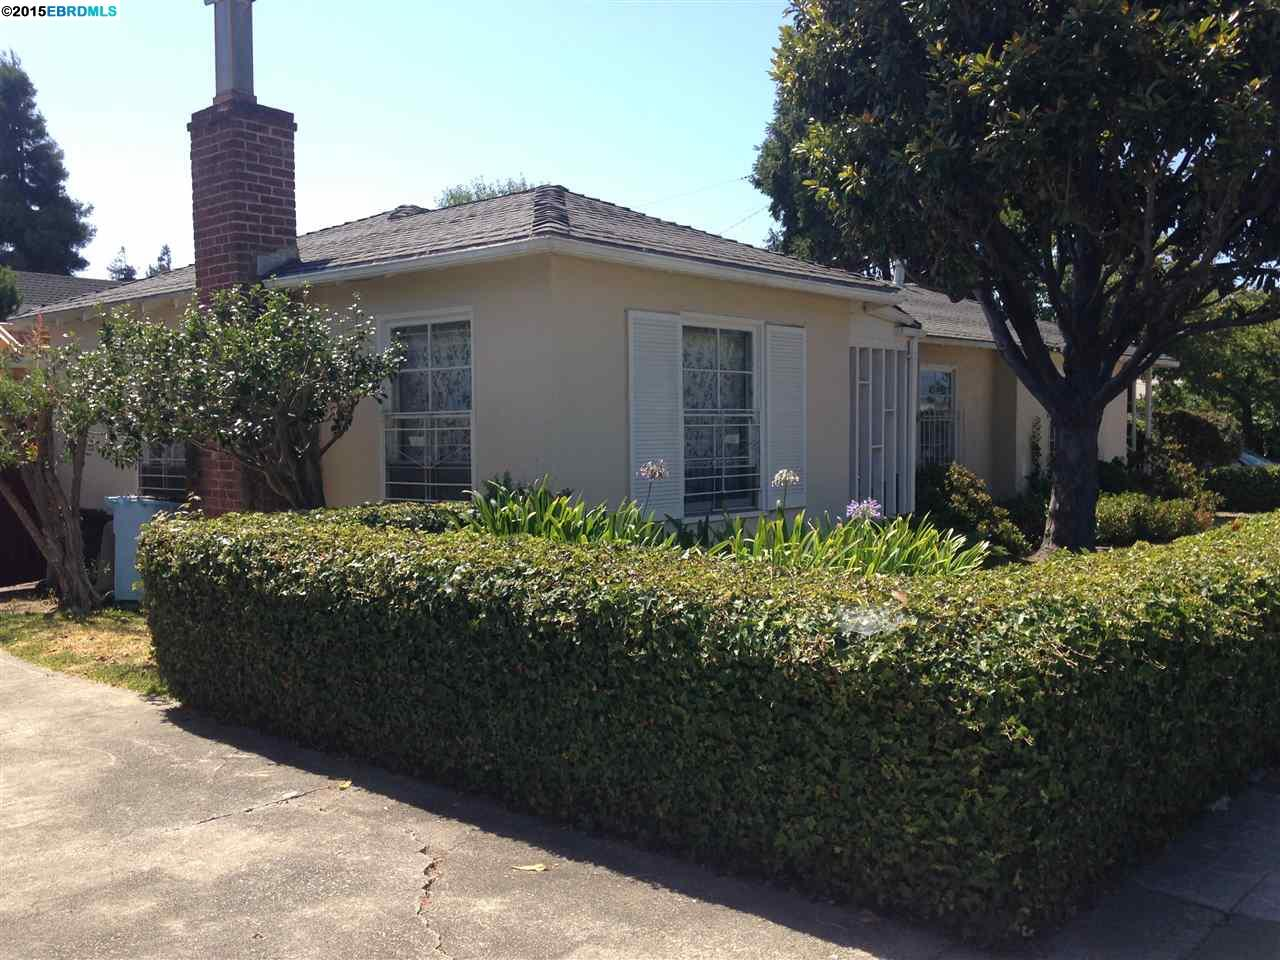 Additional photo for property listing at 1400 Allston Way  Berkeley, California 94702 Estados Unidos